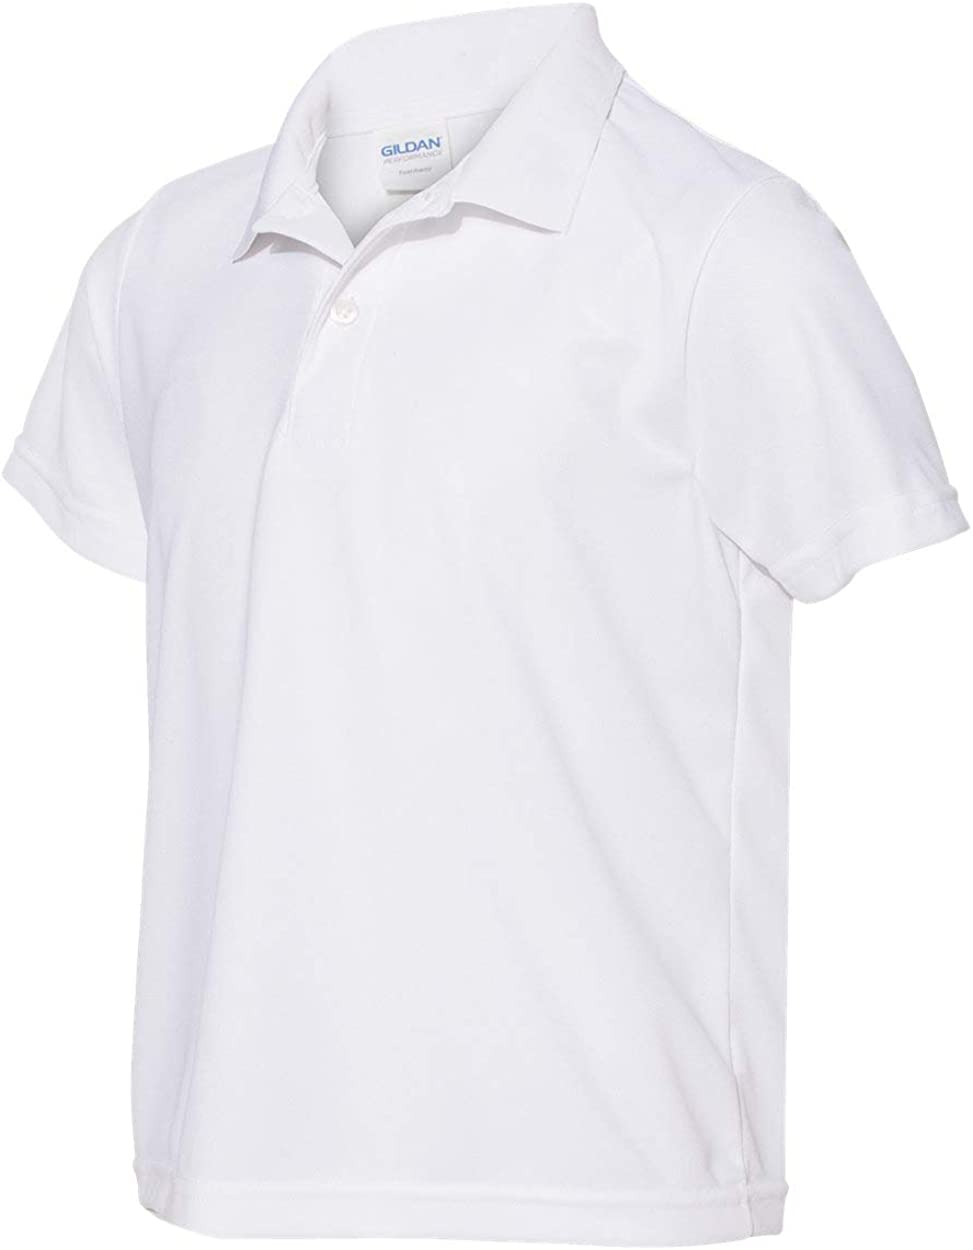 Gildan Youth PerformanceDouble Piqué Sport Shirt